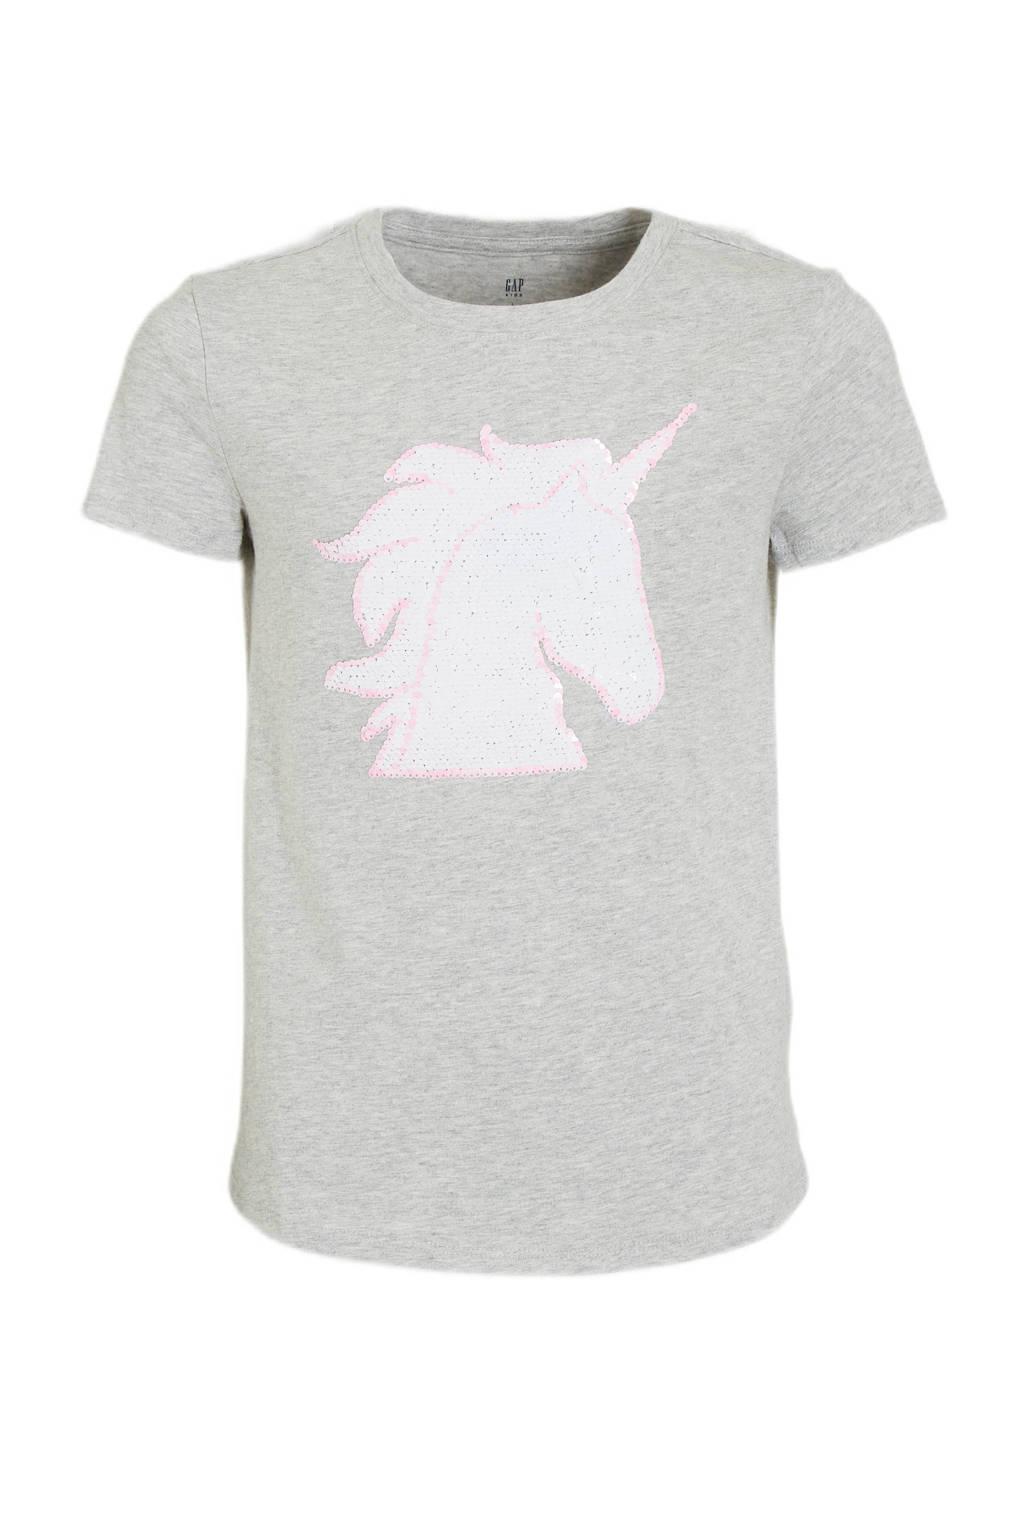 GAP T-shirt met reversible pailletten lichtgrijs, Lichtgrijs